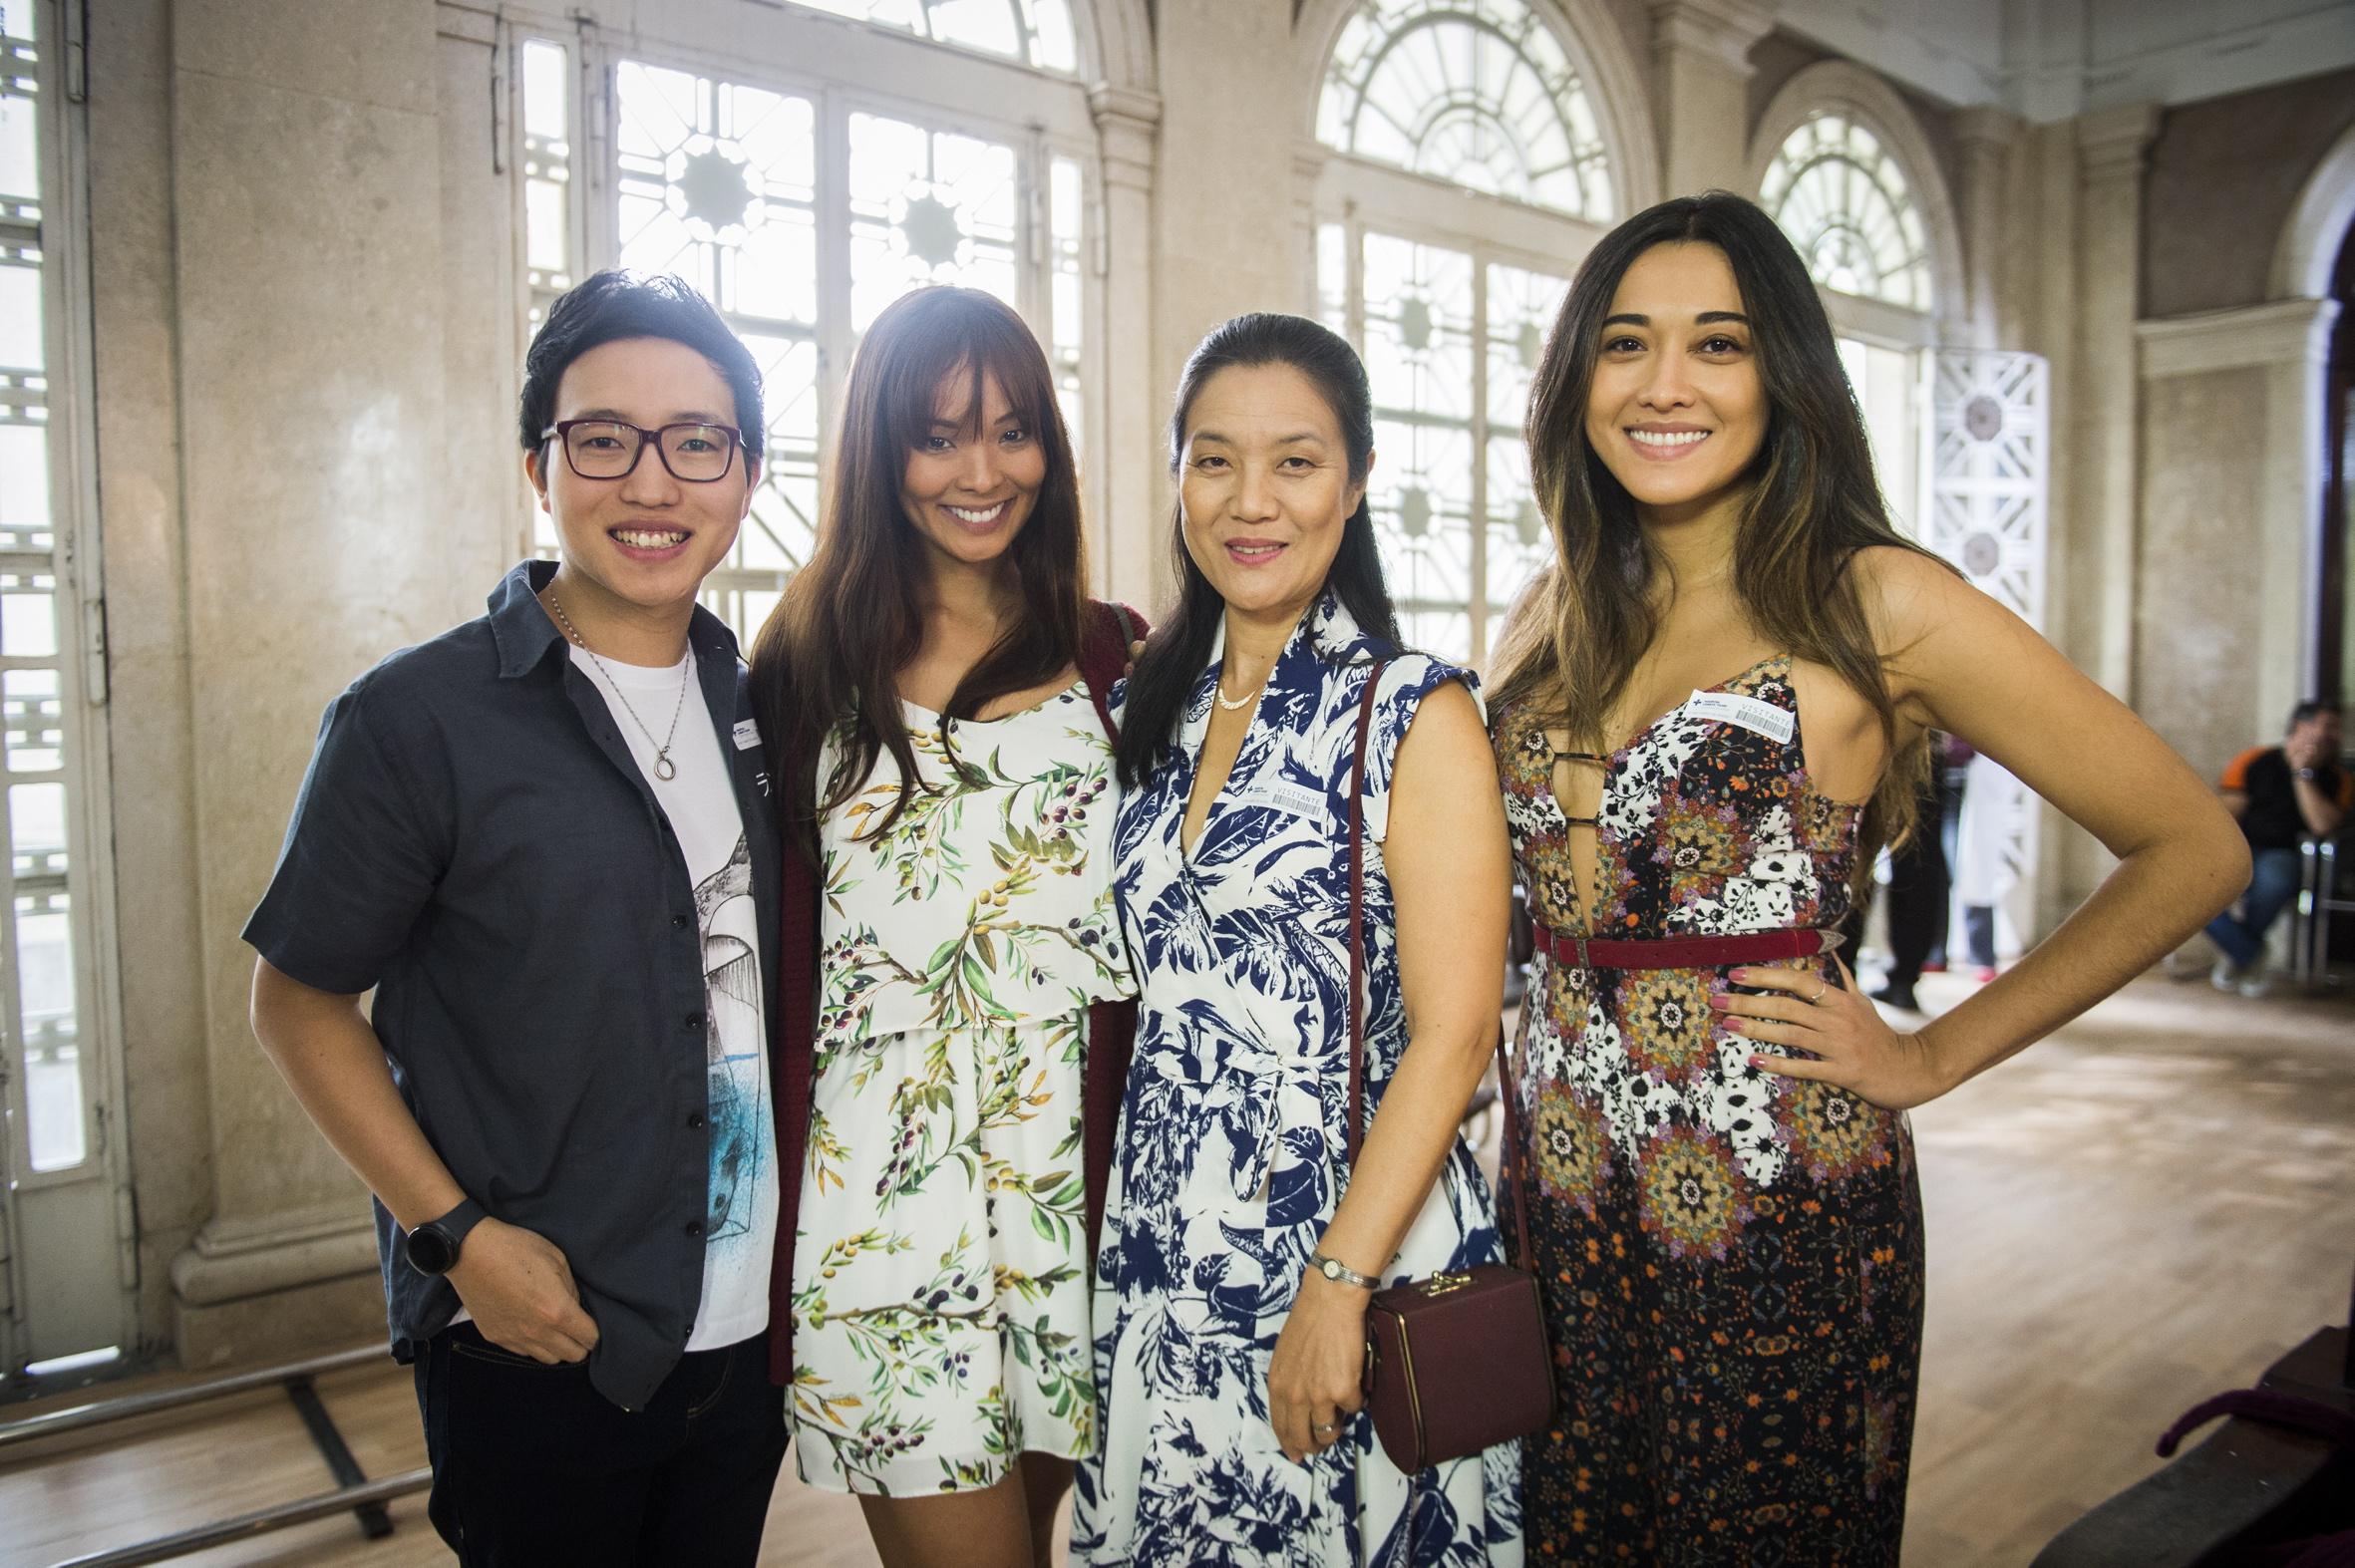 Mieko com os filhos Hideo (Paulo Chun), Hiromi (Carol Nakamura) e Yumi (Jacqueline Sato)